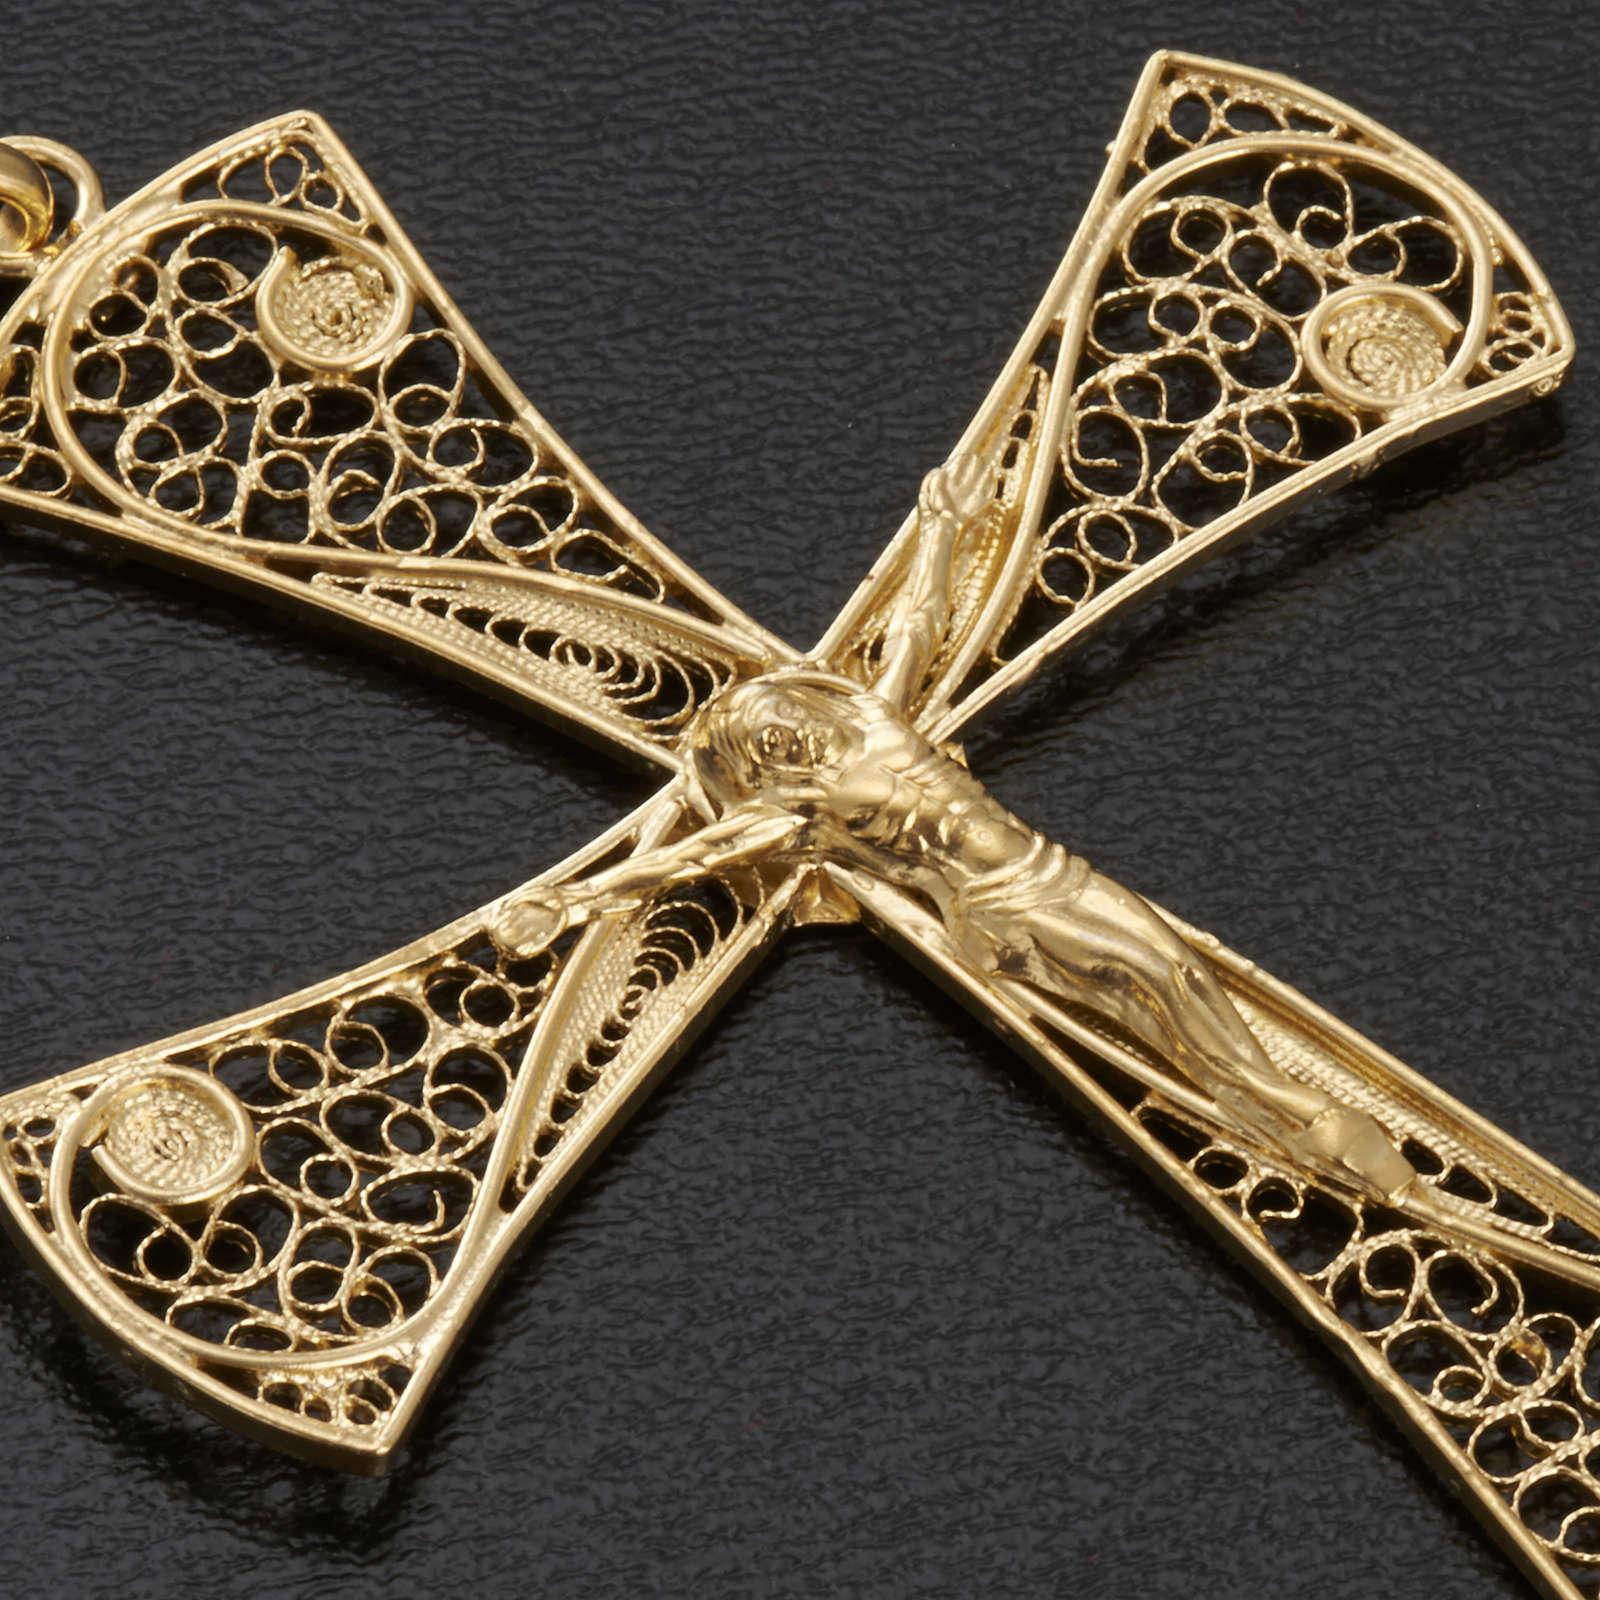 Cruz filigrana de plata 800 con baño de oro, 5,47gr 4